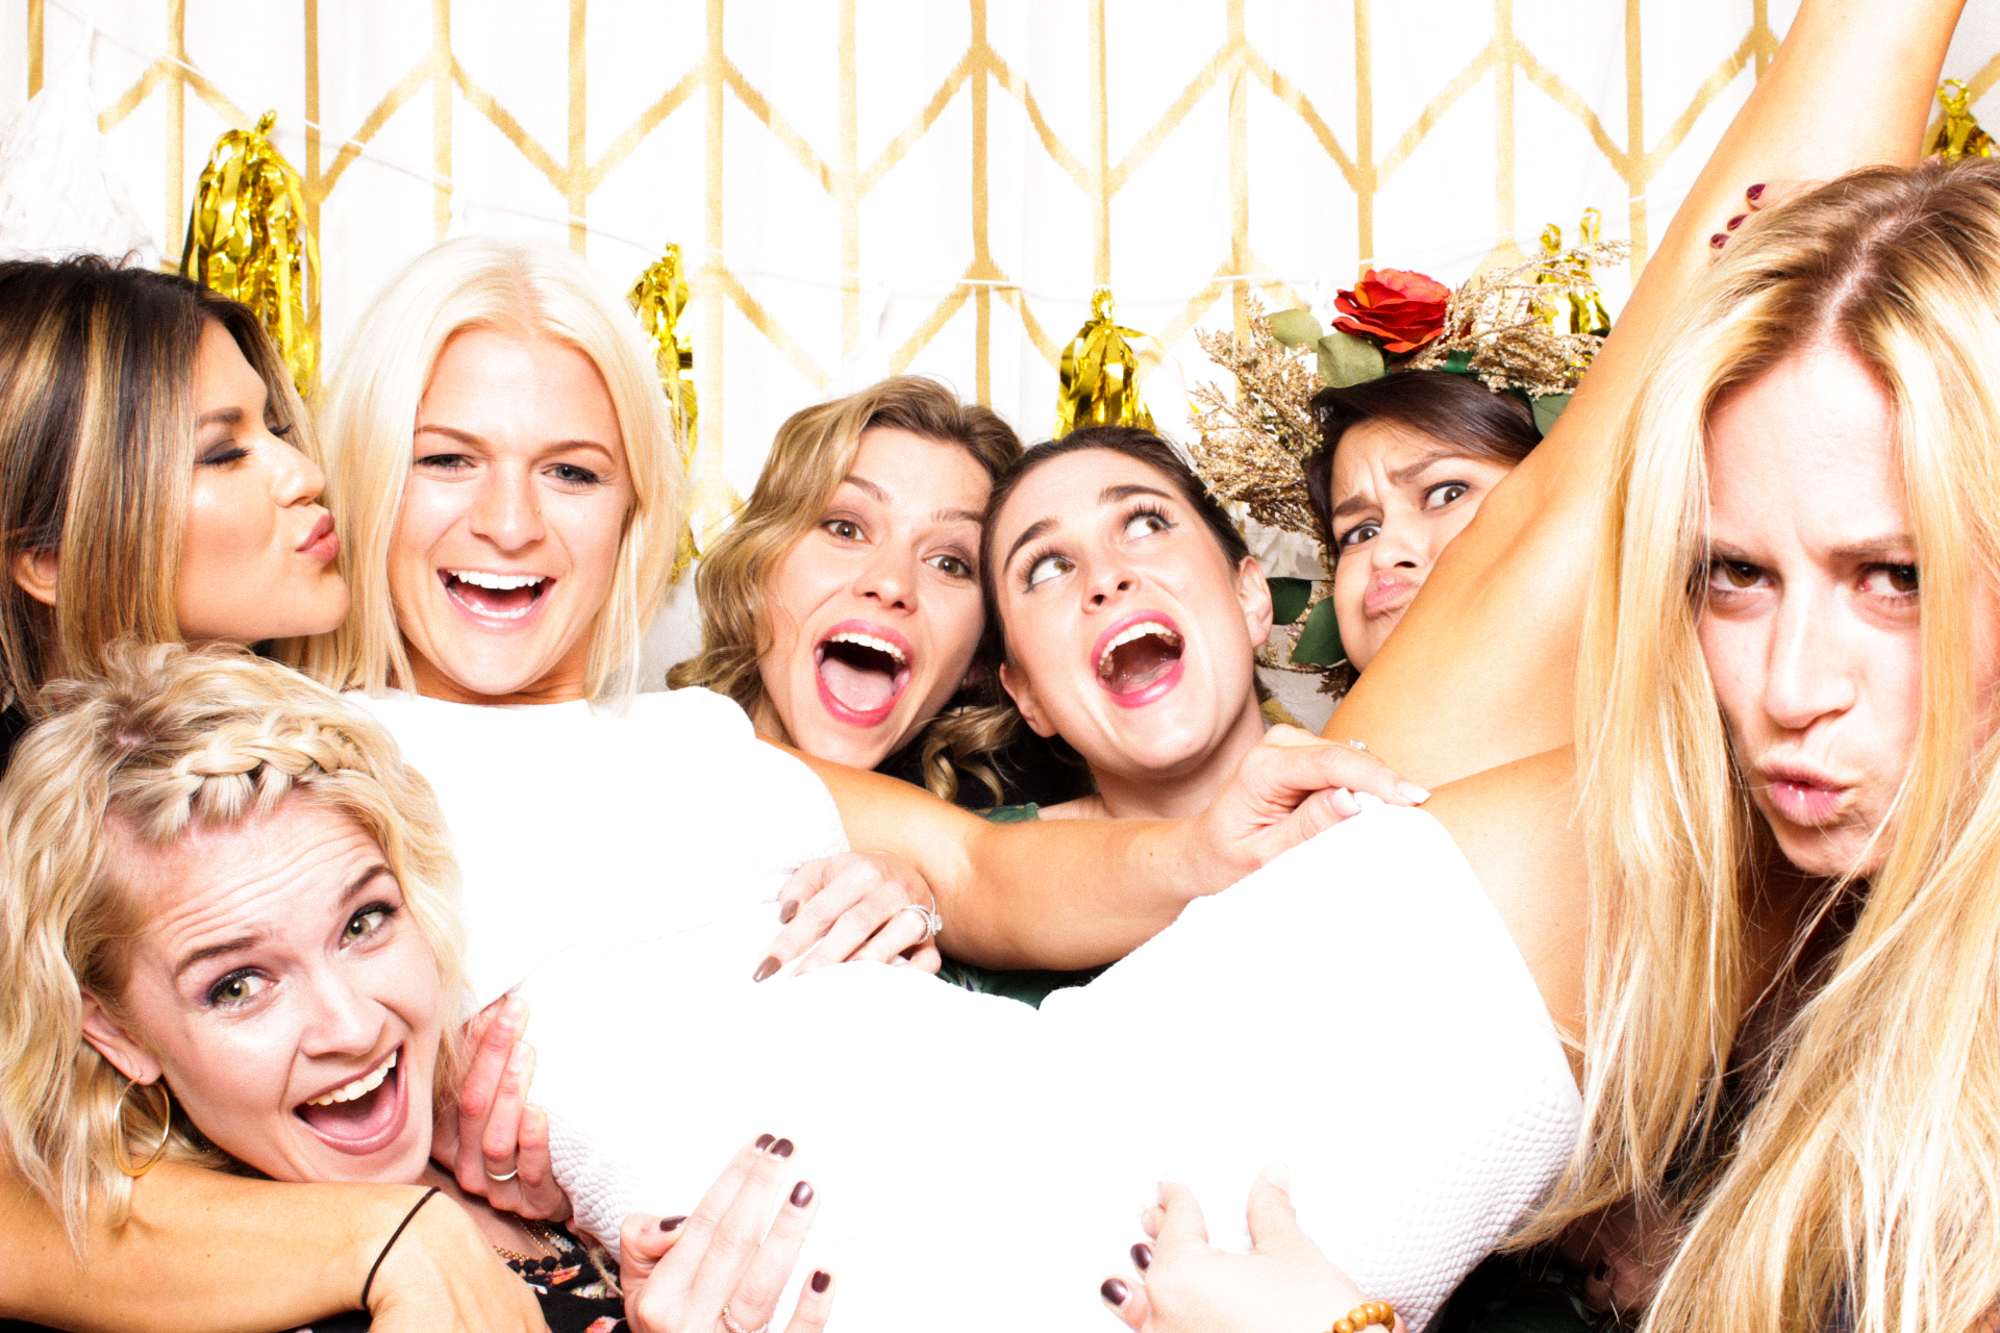 The_Reverie_Booth-Naples_Photobooth-Florida_Photobooth_Rental-Wedding_Photobooth-029.jpg